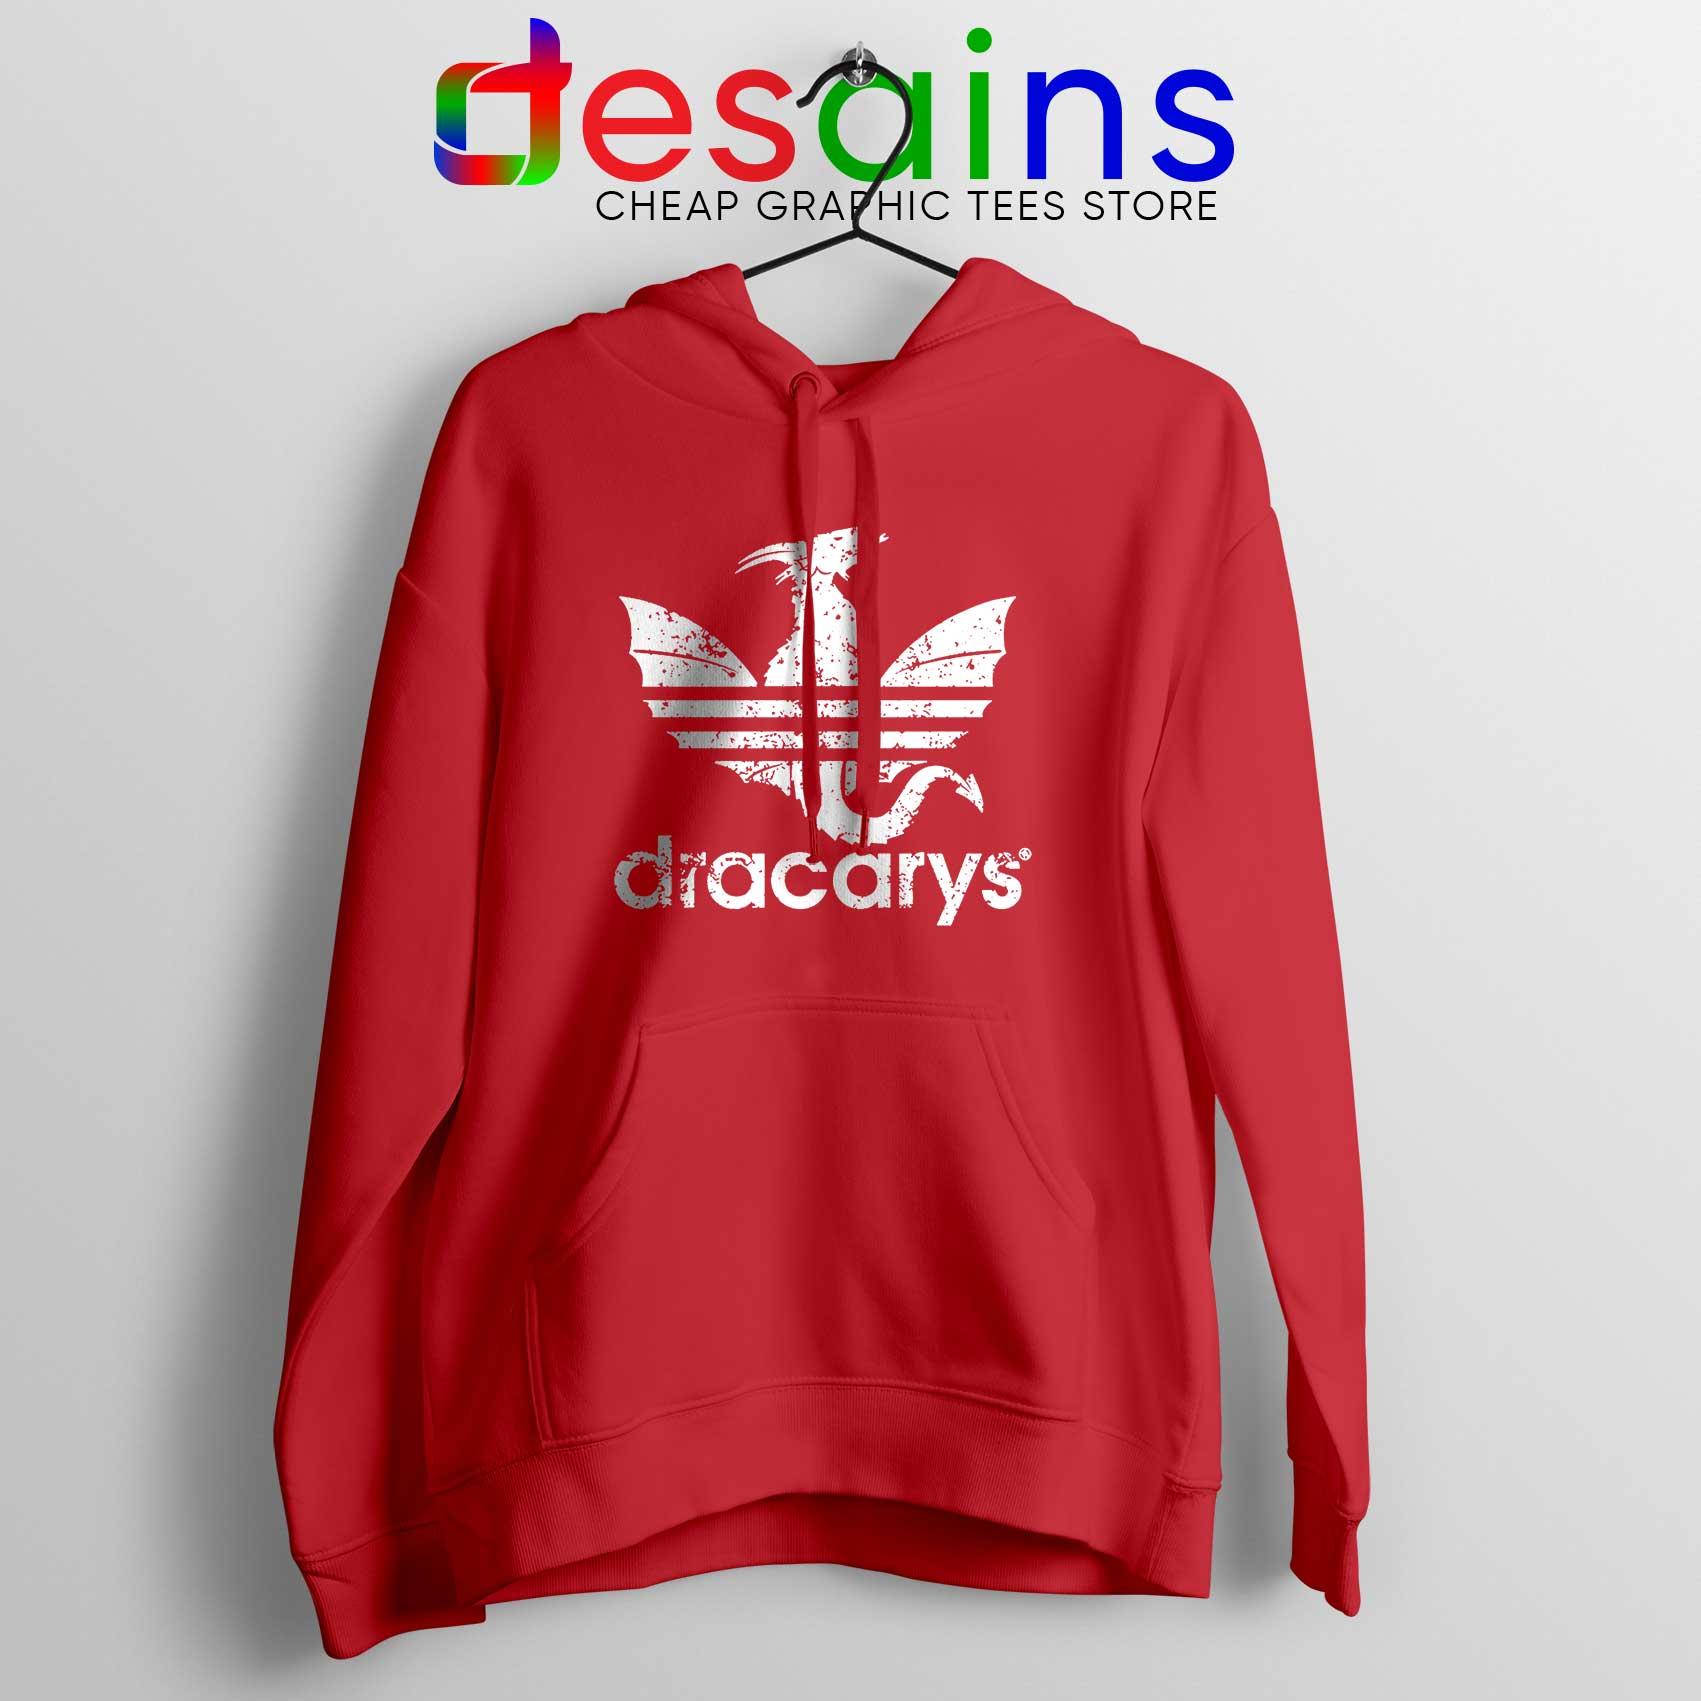 refugiados escotilla Arsenal  Best Hoodie Dracarys Dragon Adidas Logo Game Of Thrones Adult Unisex